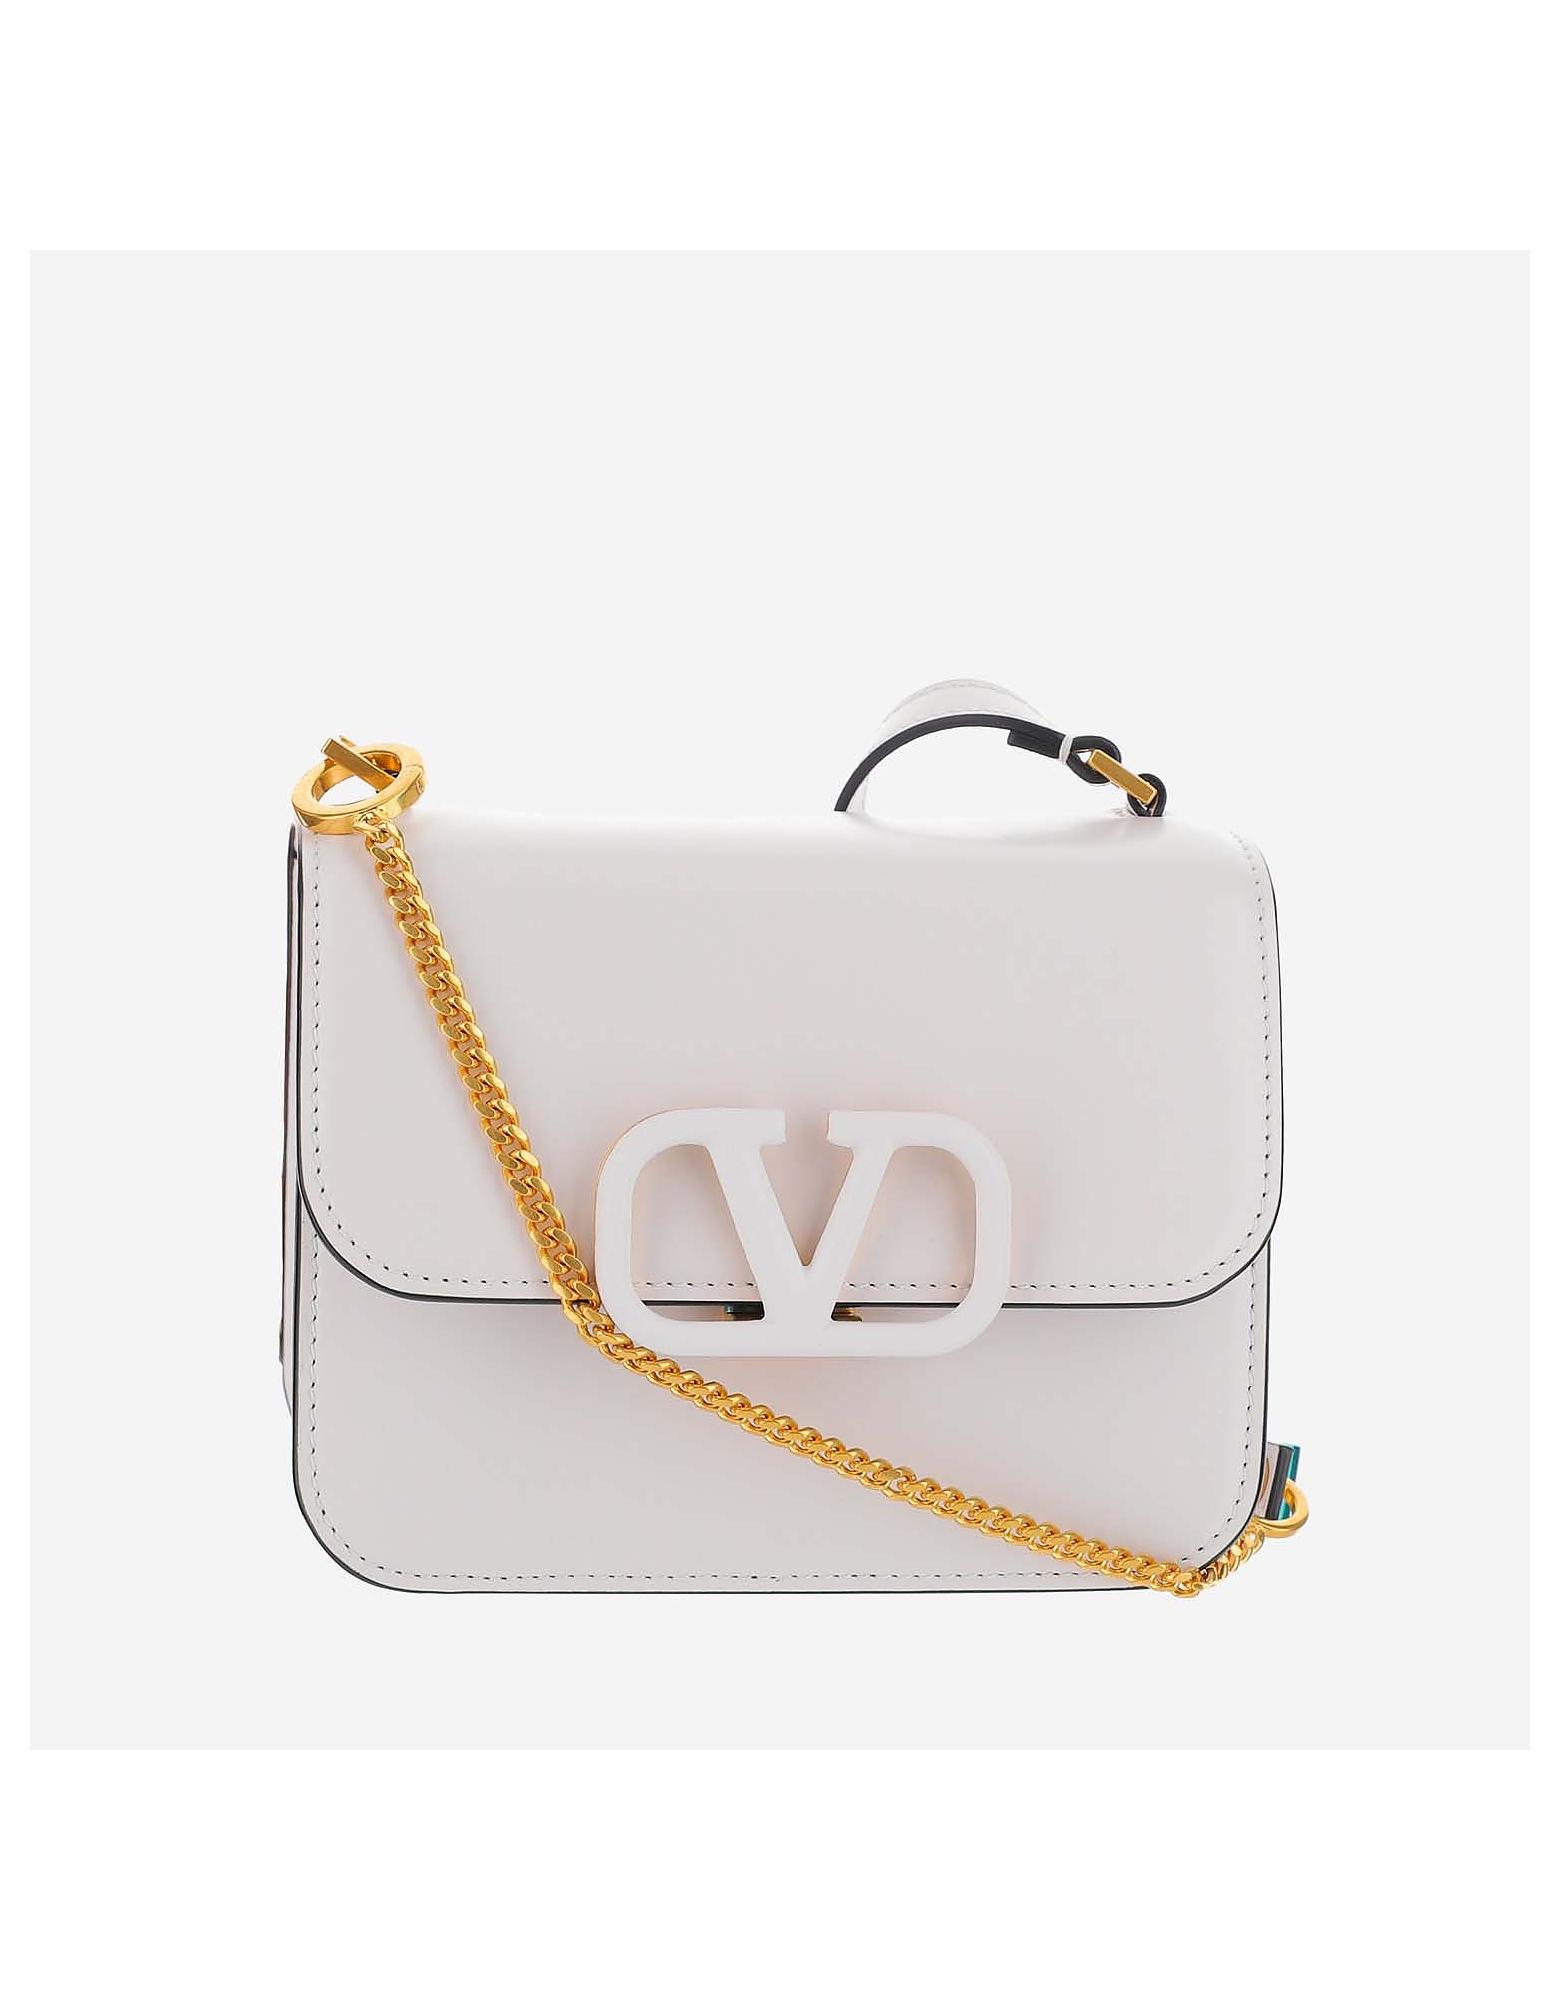 Valentino Designer Handbags, White shoulder